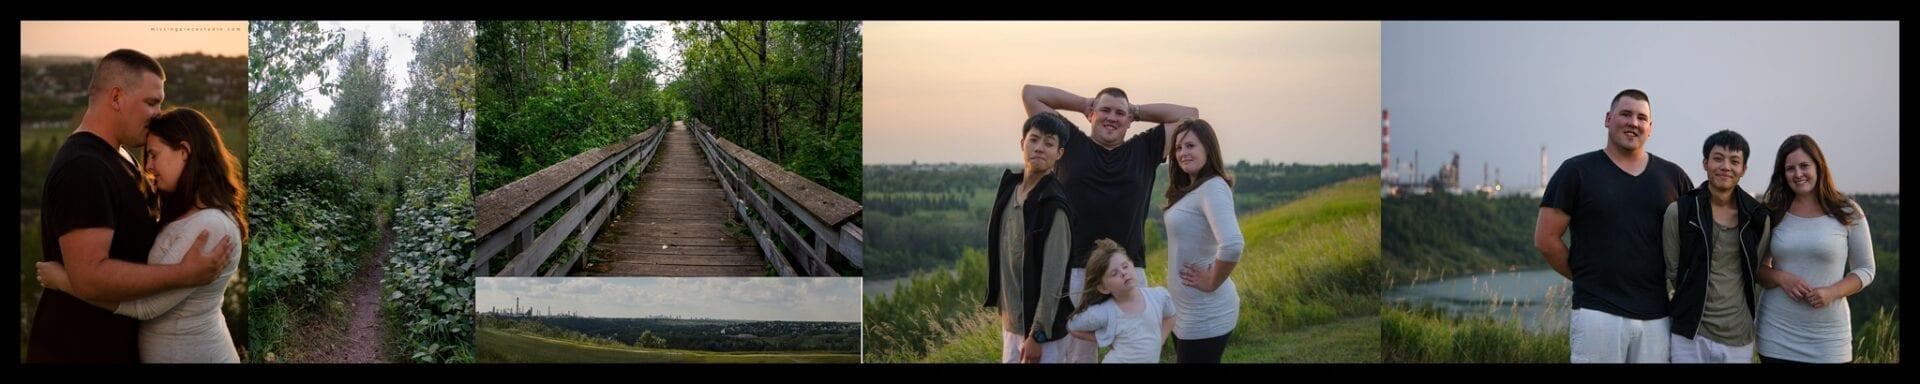 Edmonton Family Portrait Photography Candid-collage019